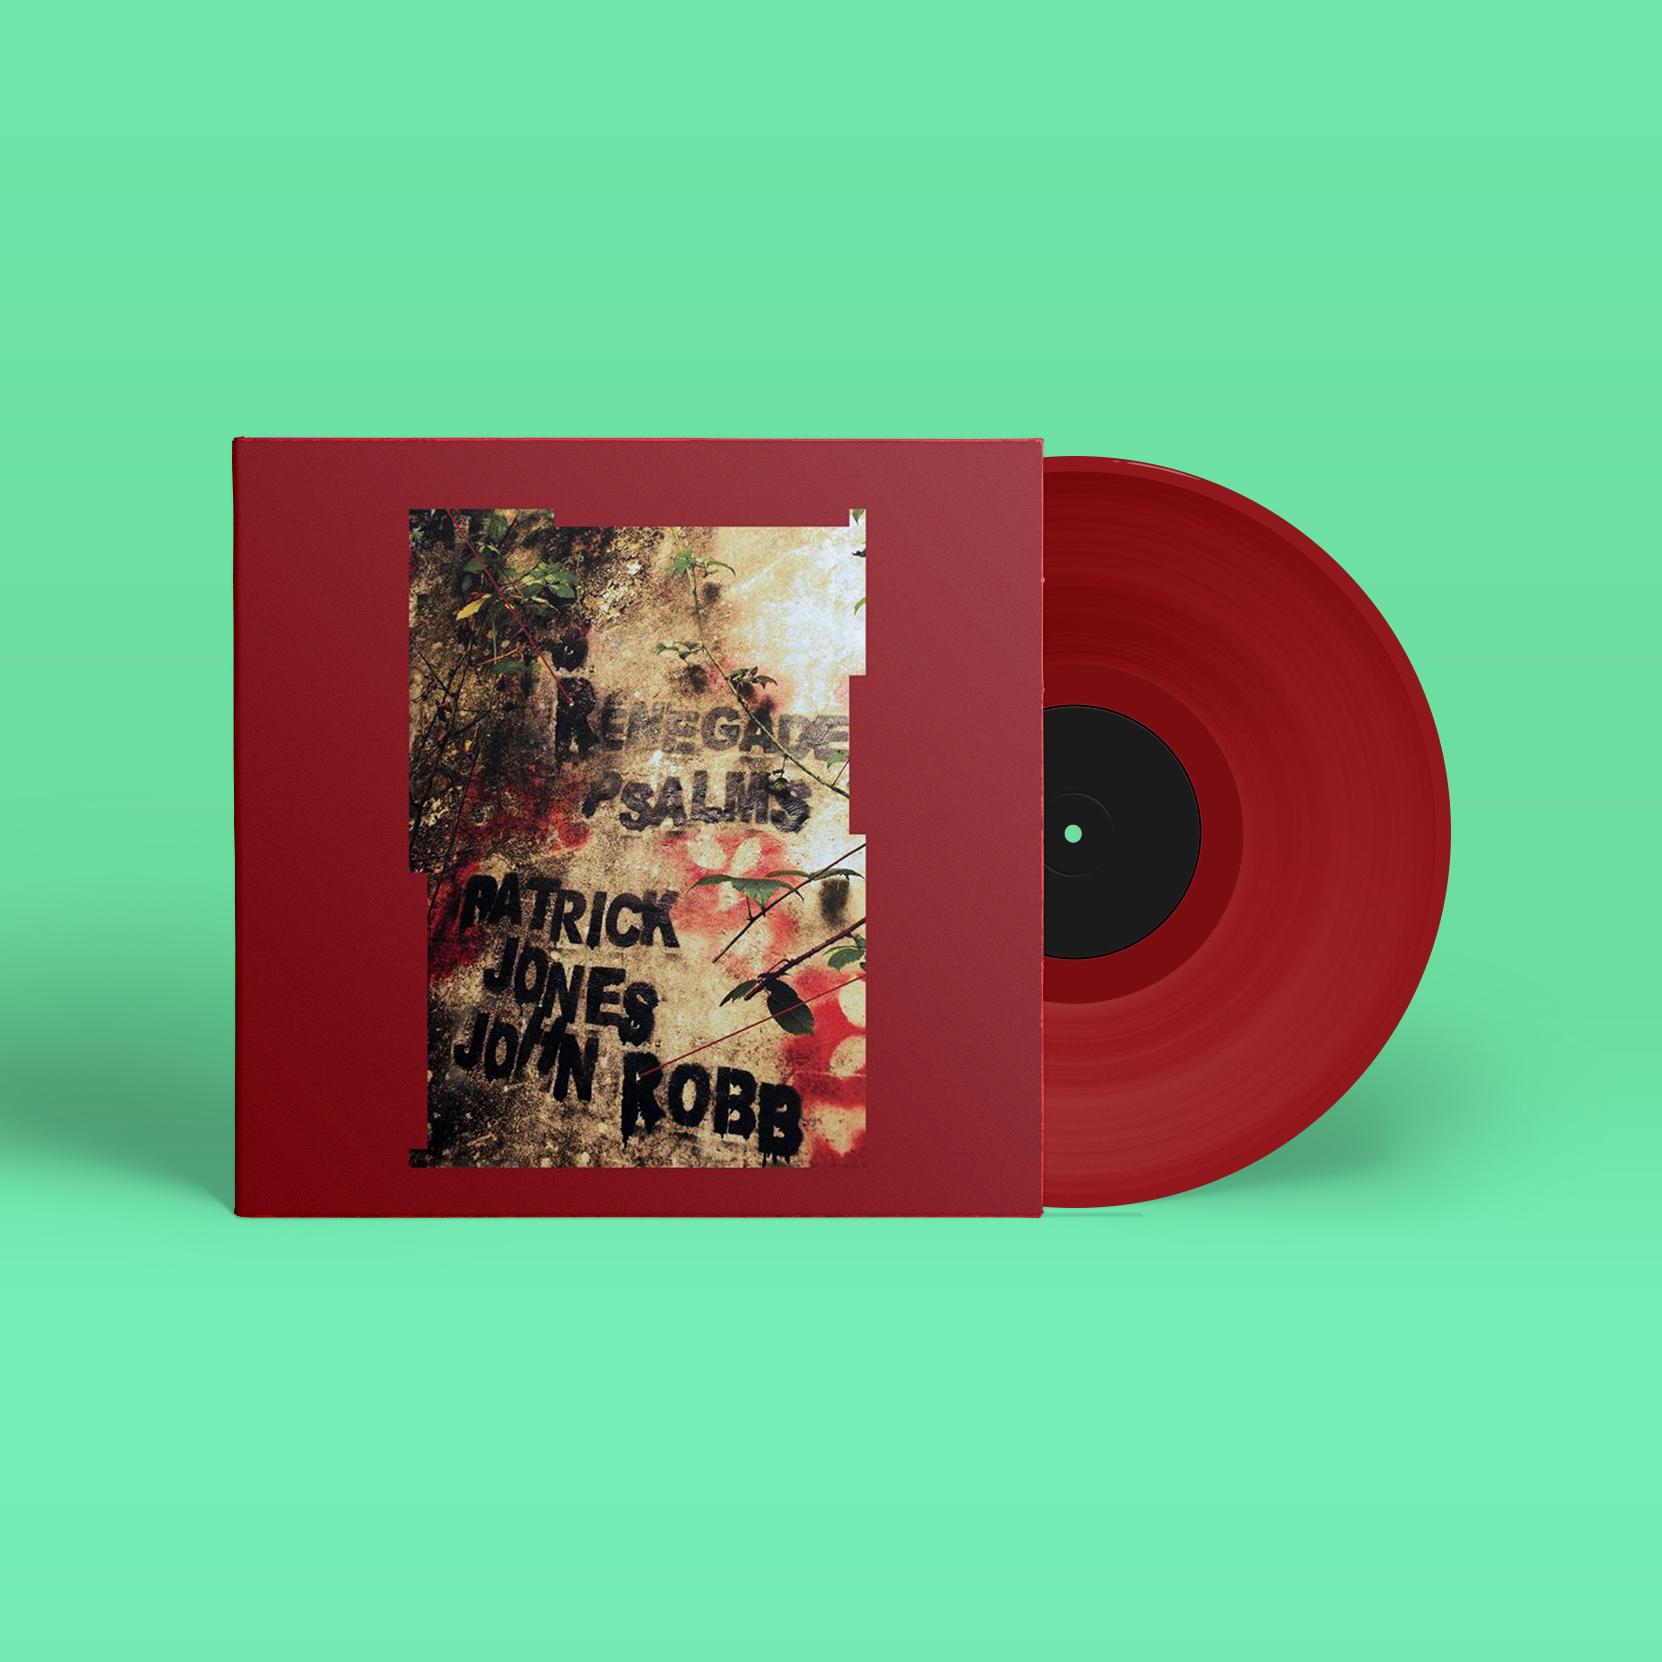 Renegade Psalms (Red vinyl edition) Patrick Jones & John Robb